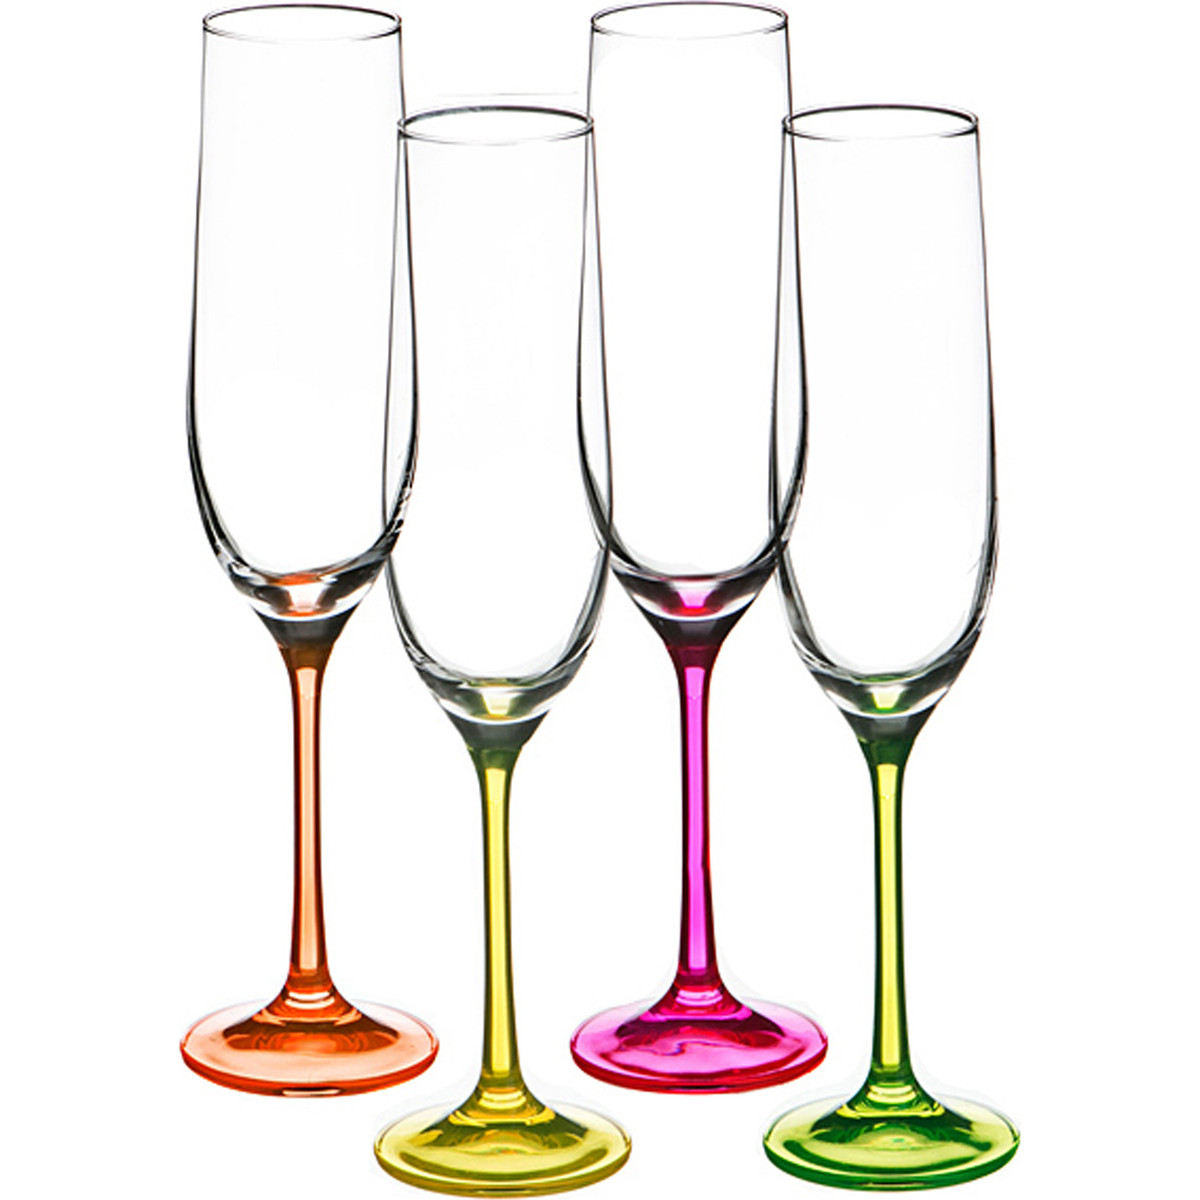 {} Bohemia Crystal Набор бокалов для шампанского Cedar  (24 см - 4 шт) набор для кофе crystal bohemia mokko 4 предмета